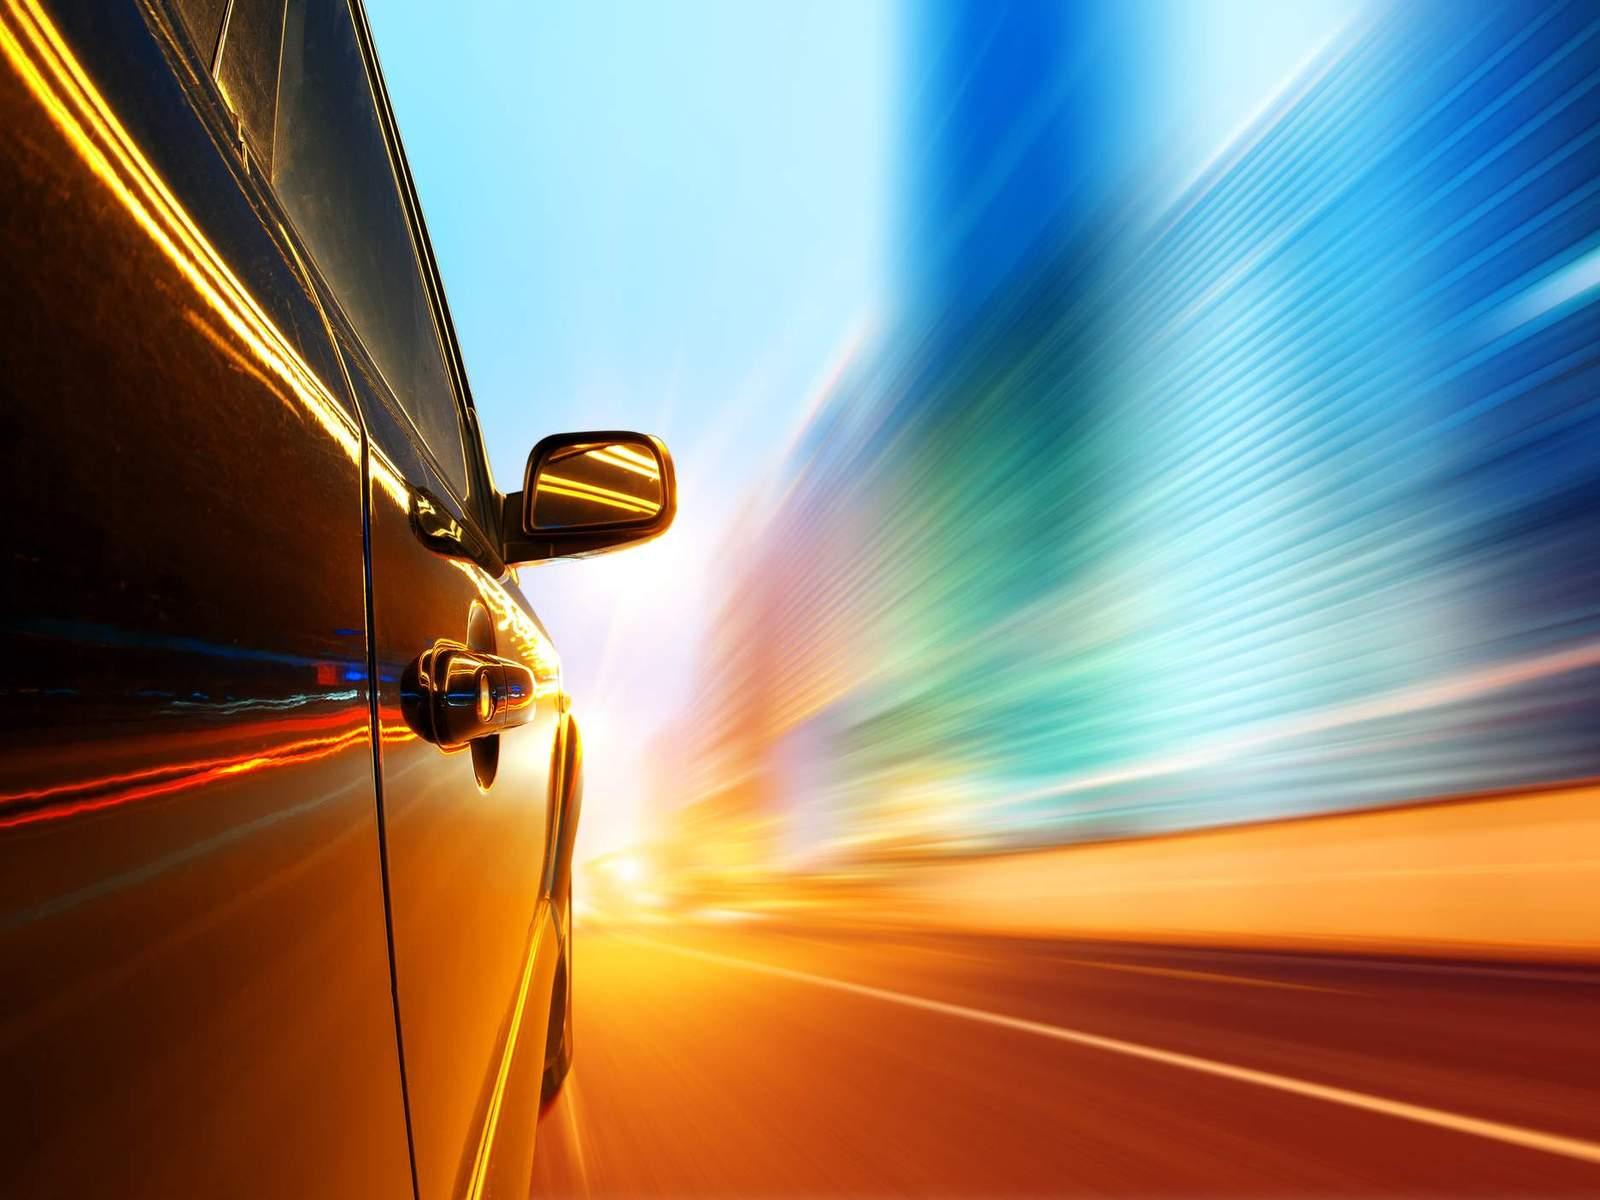 Грилиша лишили водительских прав за два инцидента на дороге